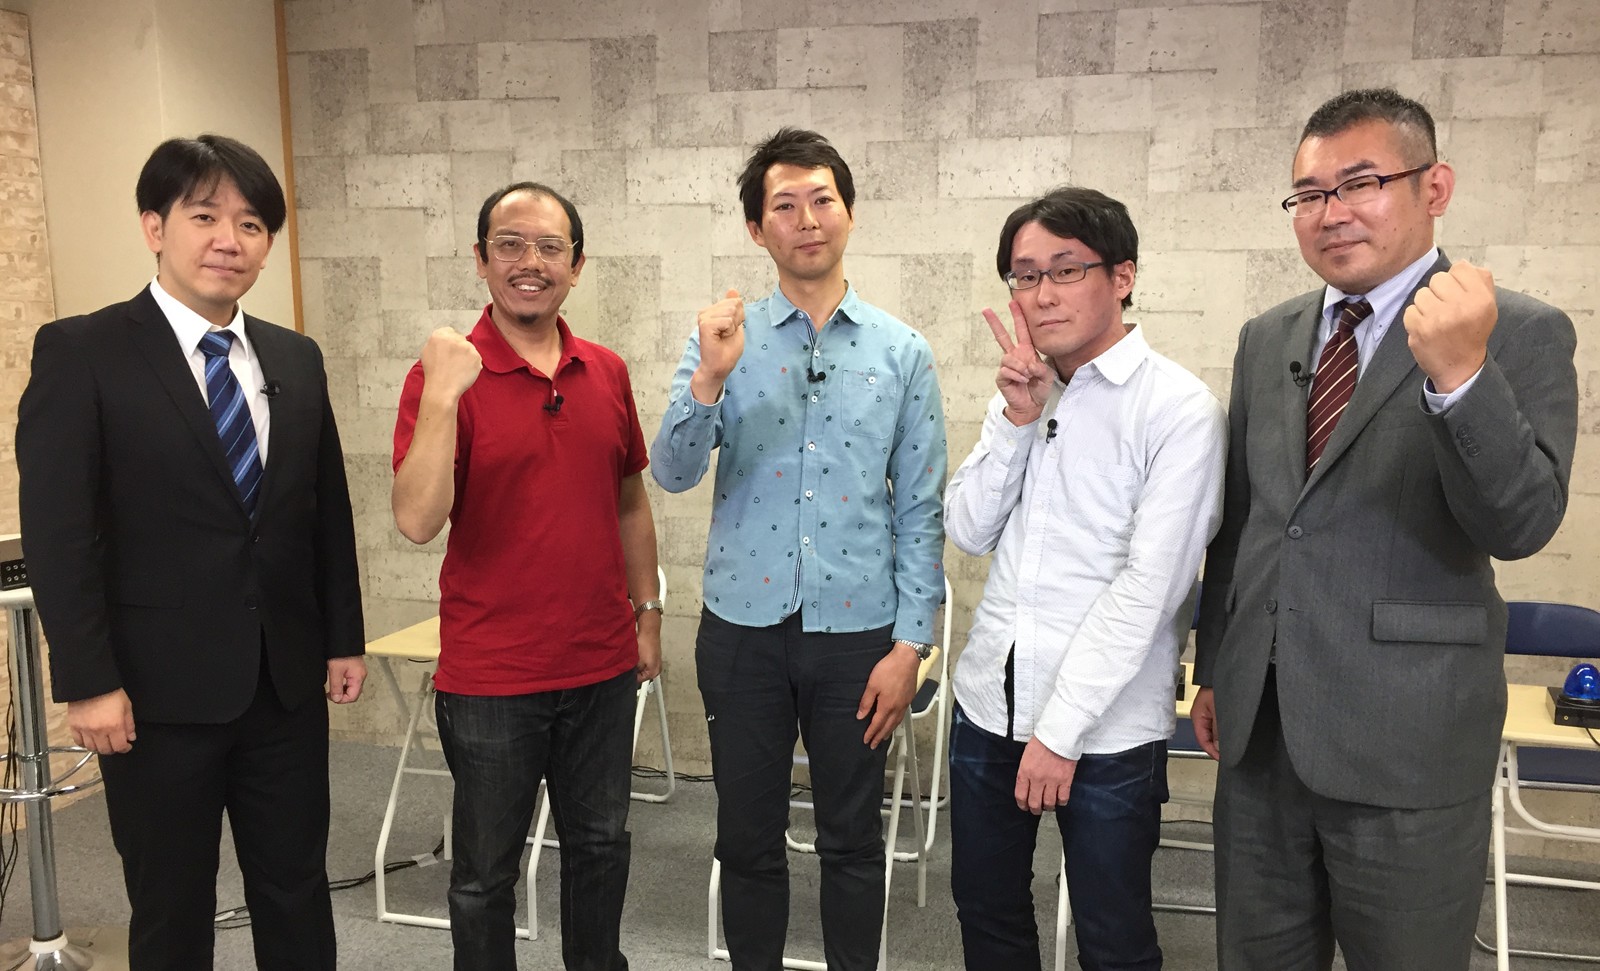 QUIZ JAPAN TVのオリジナルクイズ番組「魁!!クイズ塾」第26回は「第3回クイズサークル代表者大会」!